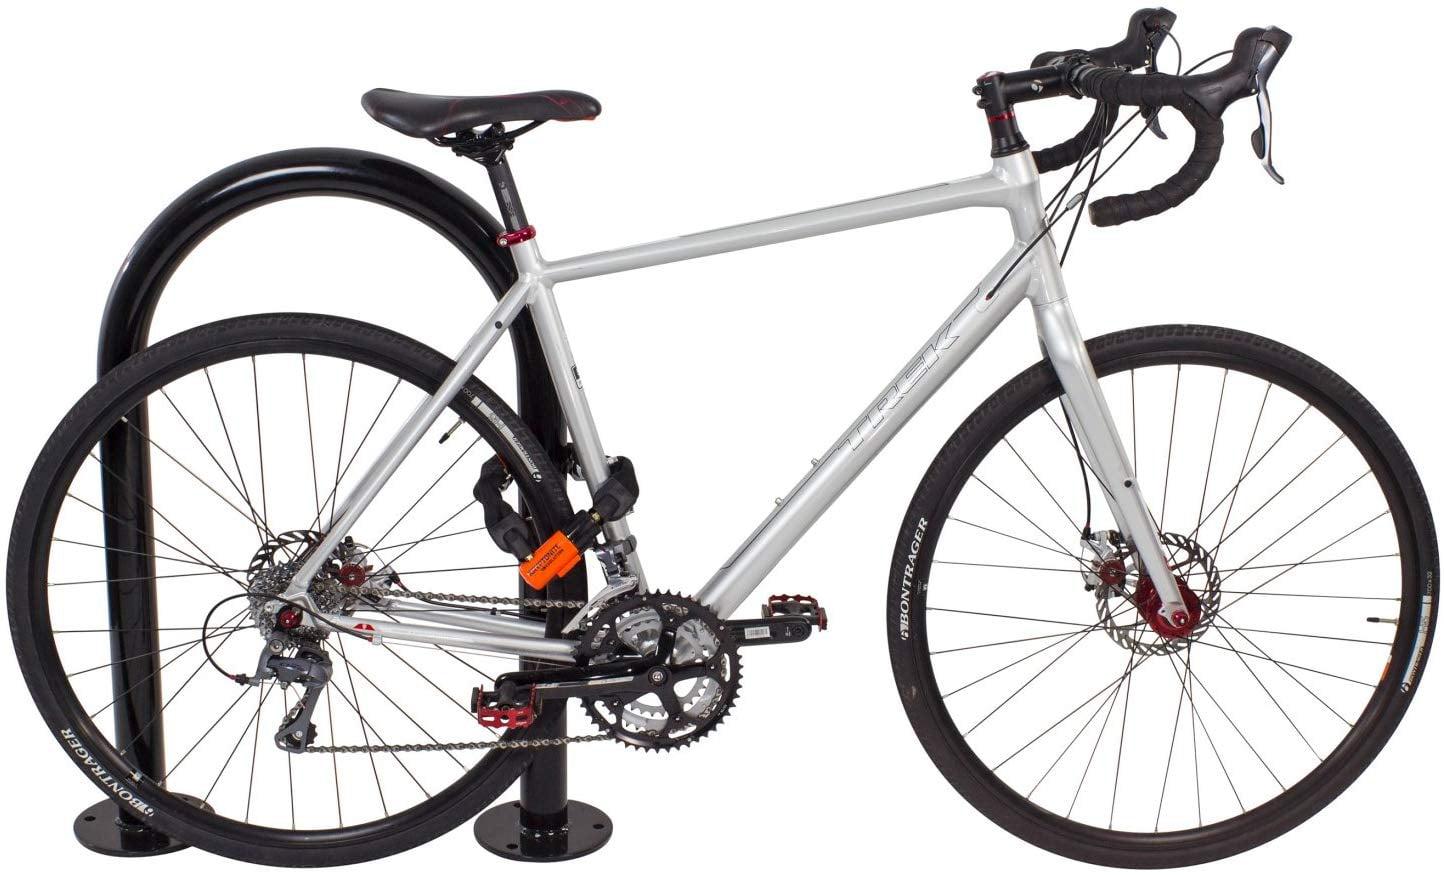 Kryptonite Evolution Series 4 1090 Integrated Key 90cm Chain Lock Bike Security